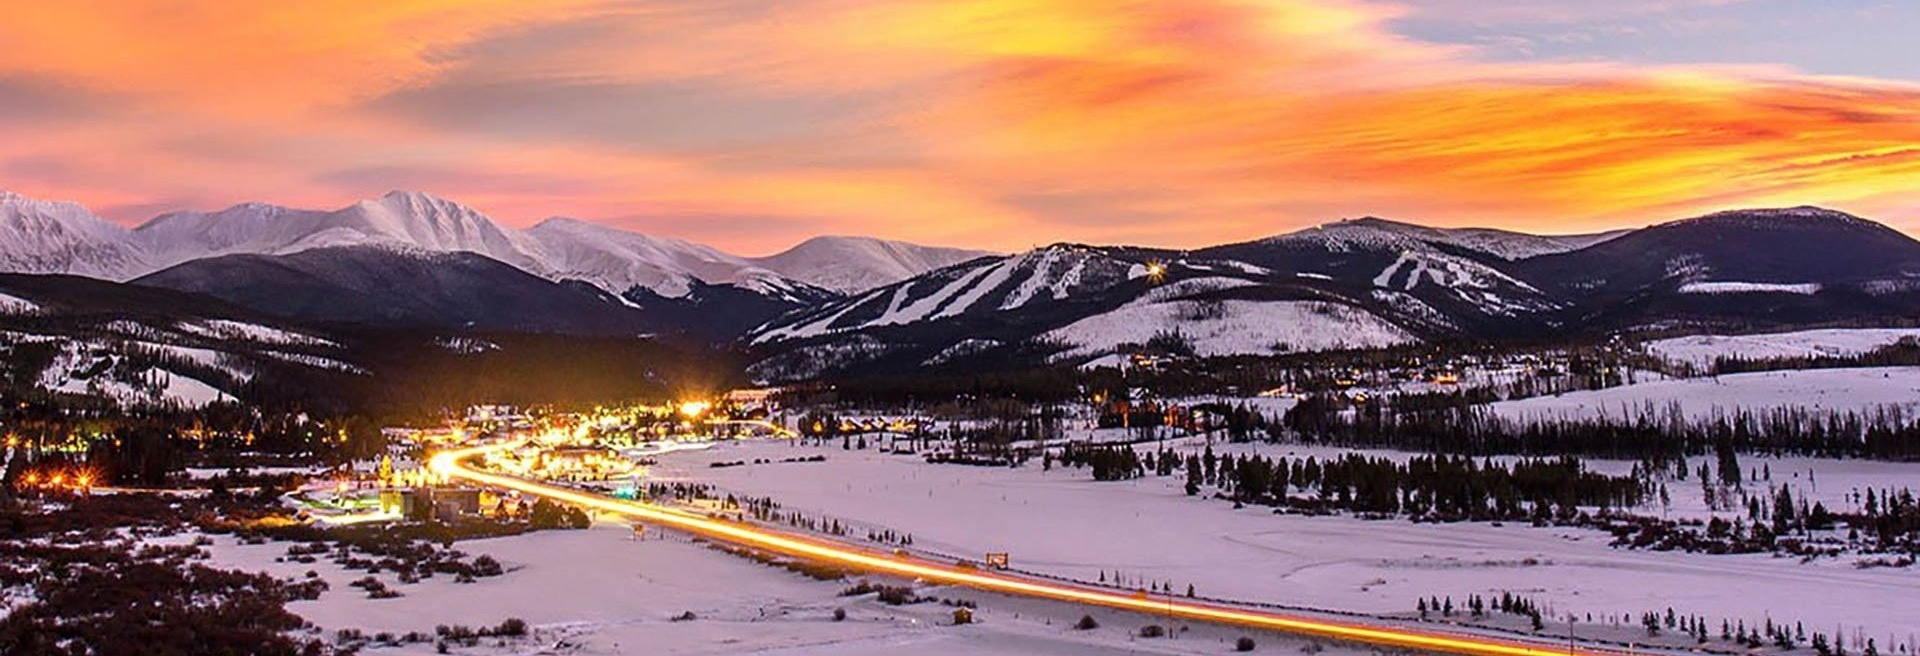 winterparkme-image2-924851-edited-966476-edited